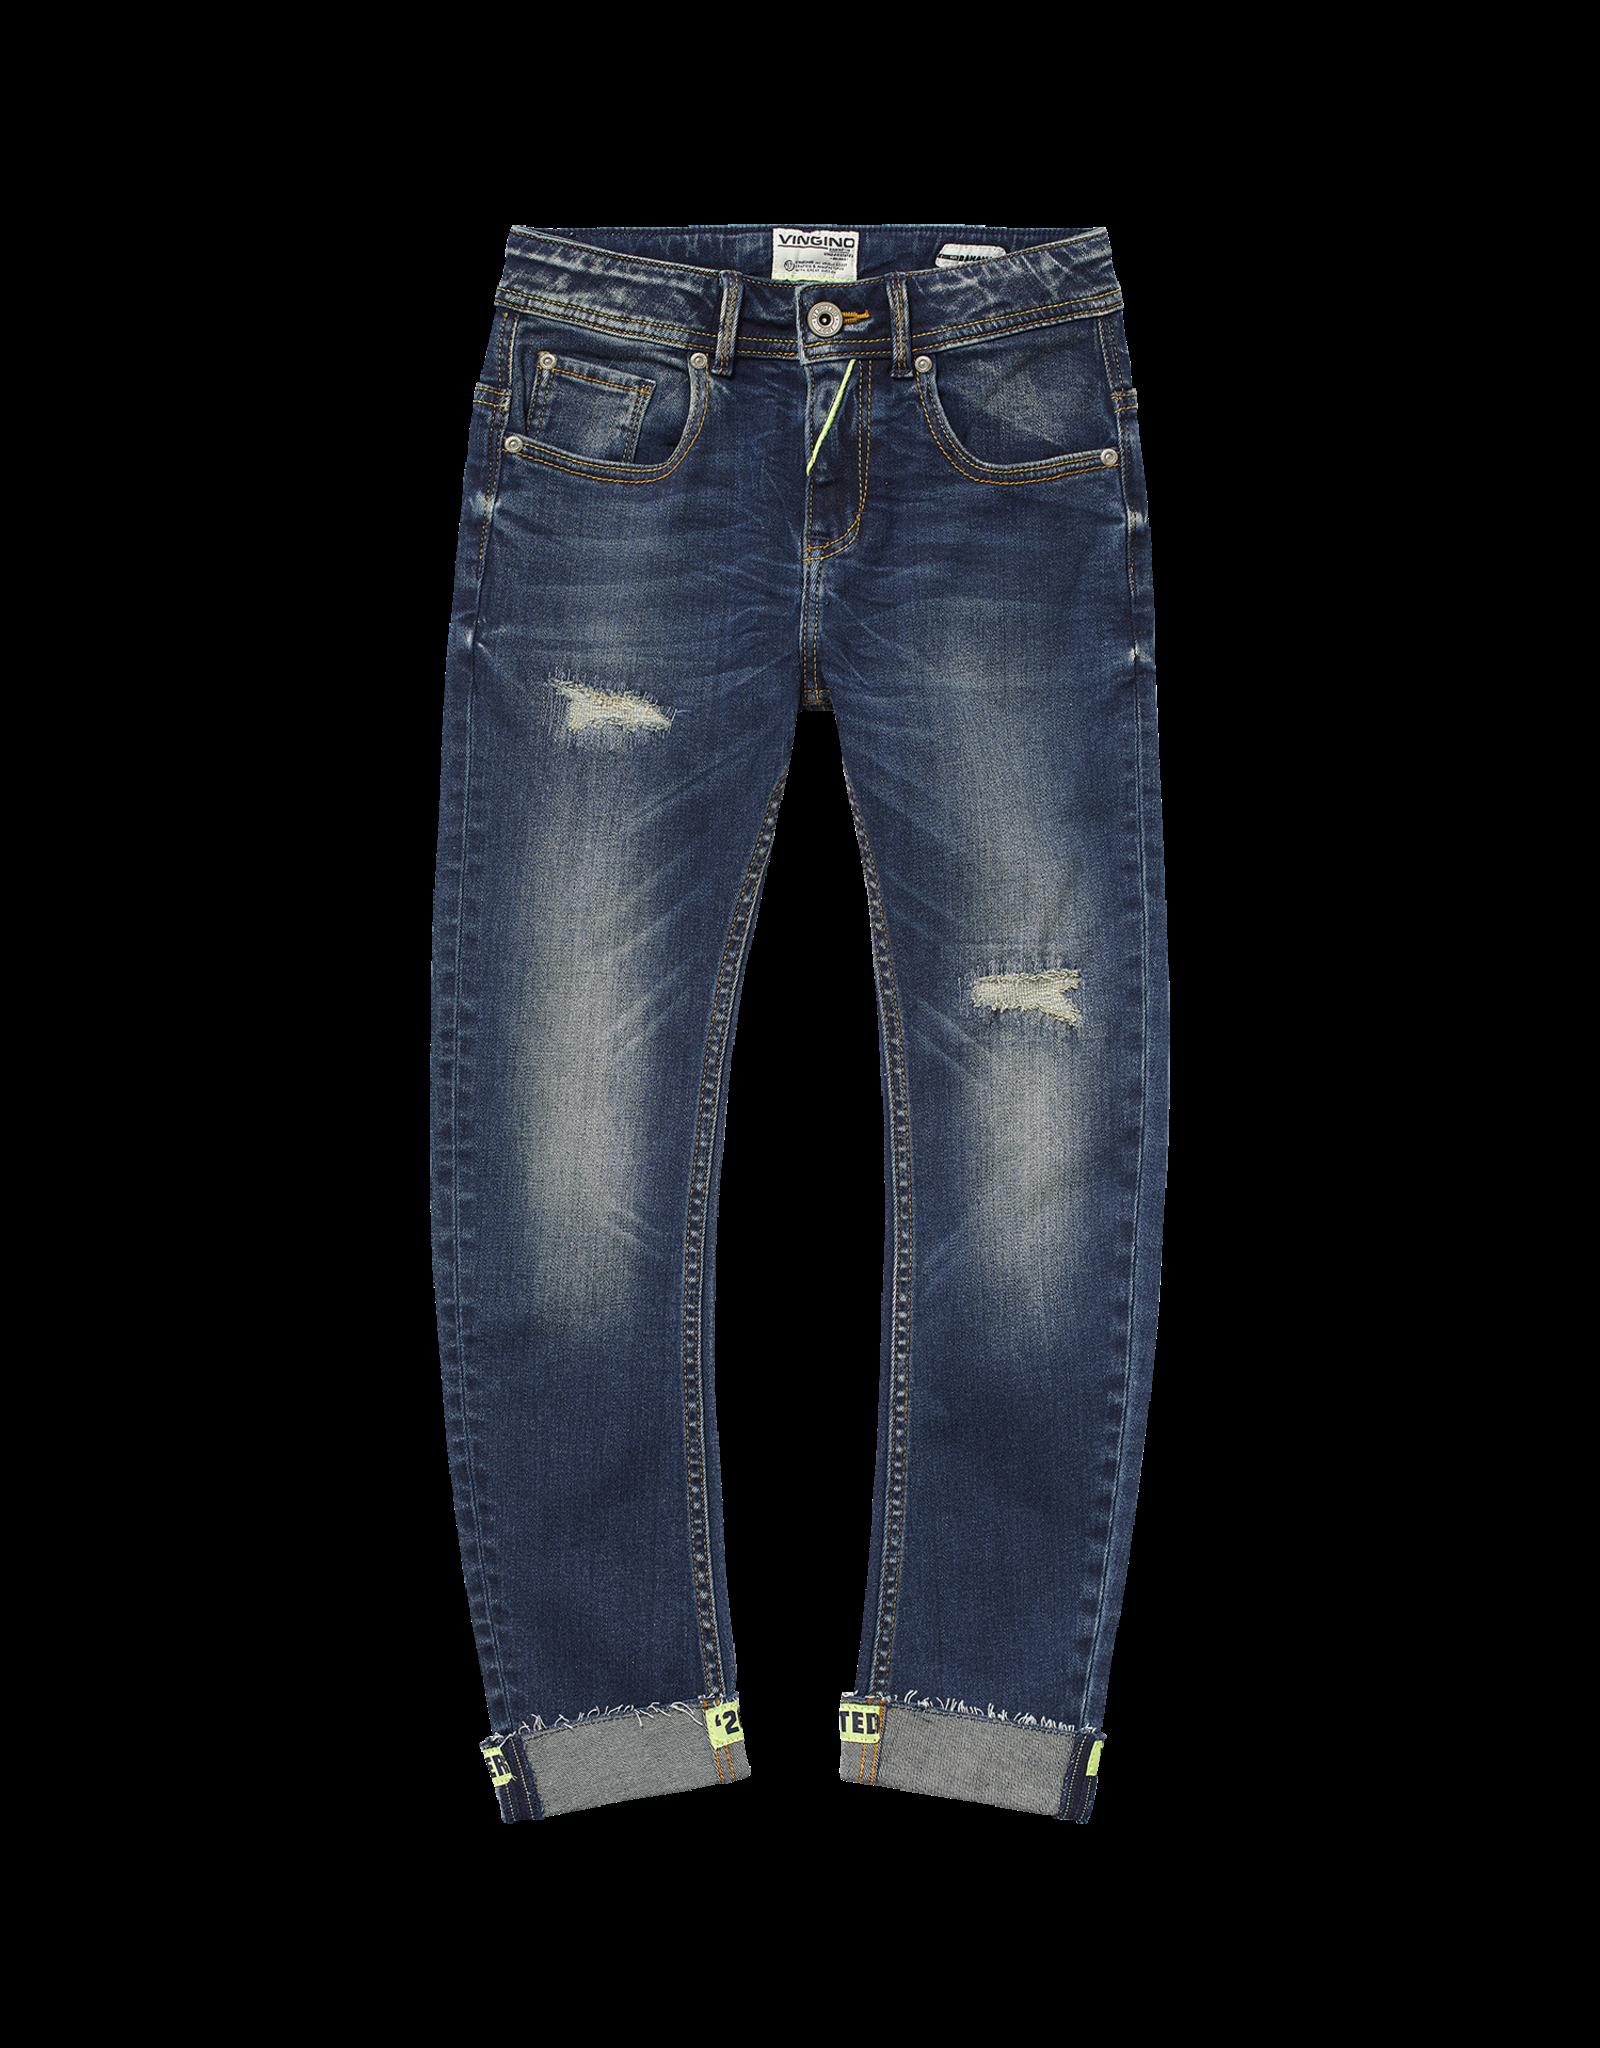 Vingino Comodo Jeans 160 Old Vintage